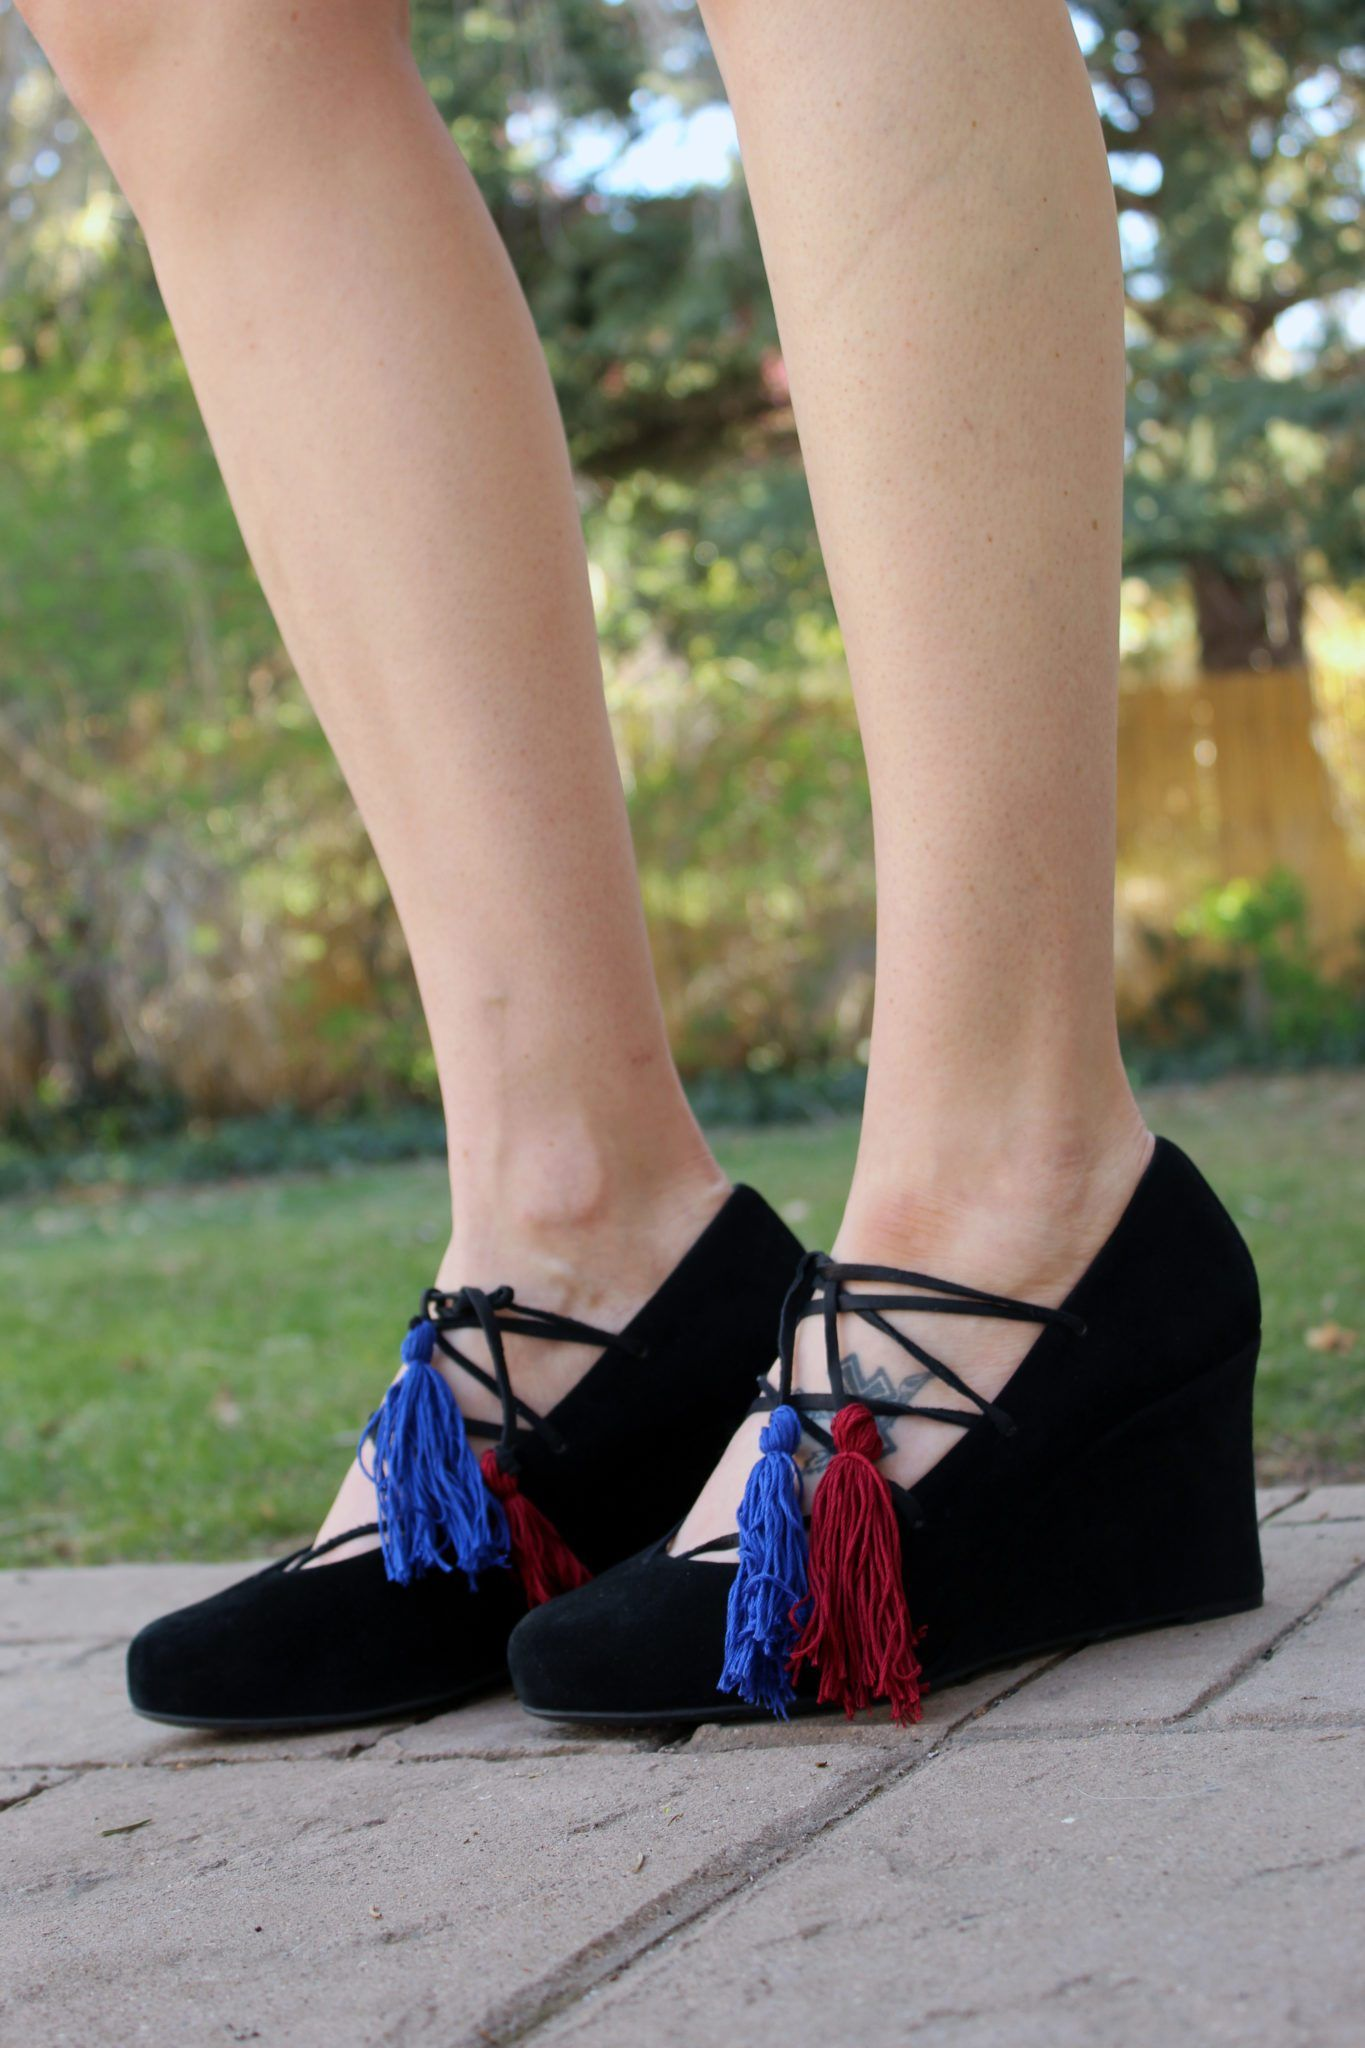 DIY Shoe Heels Makeover - All For Fashions - fashion